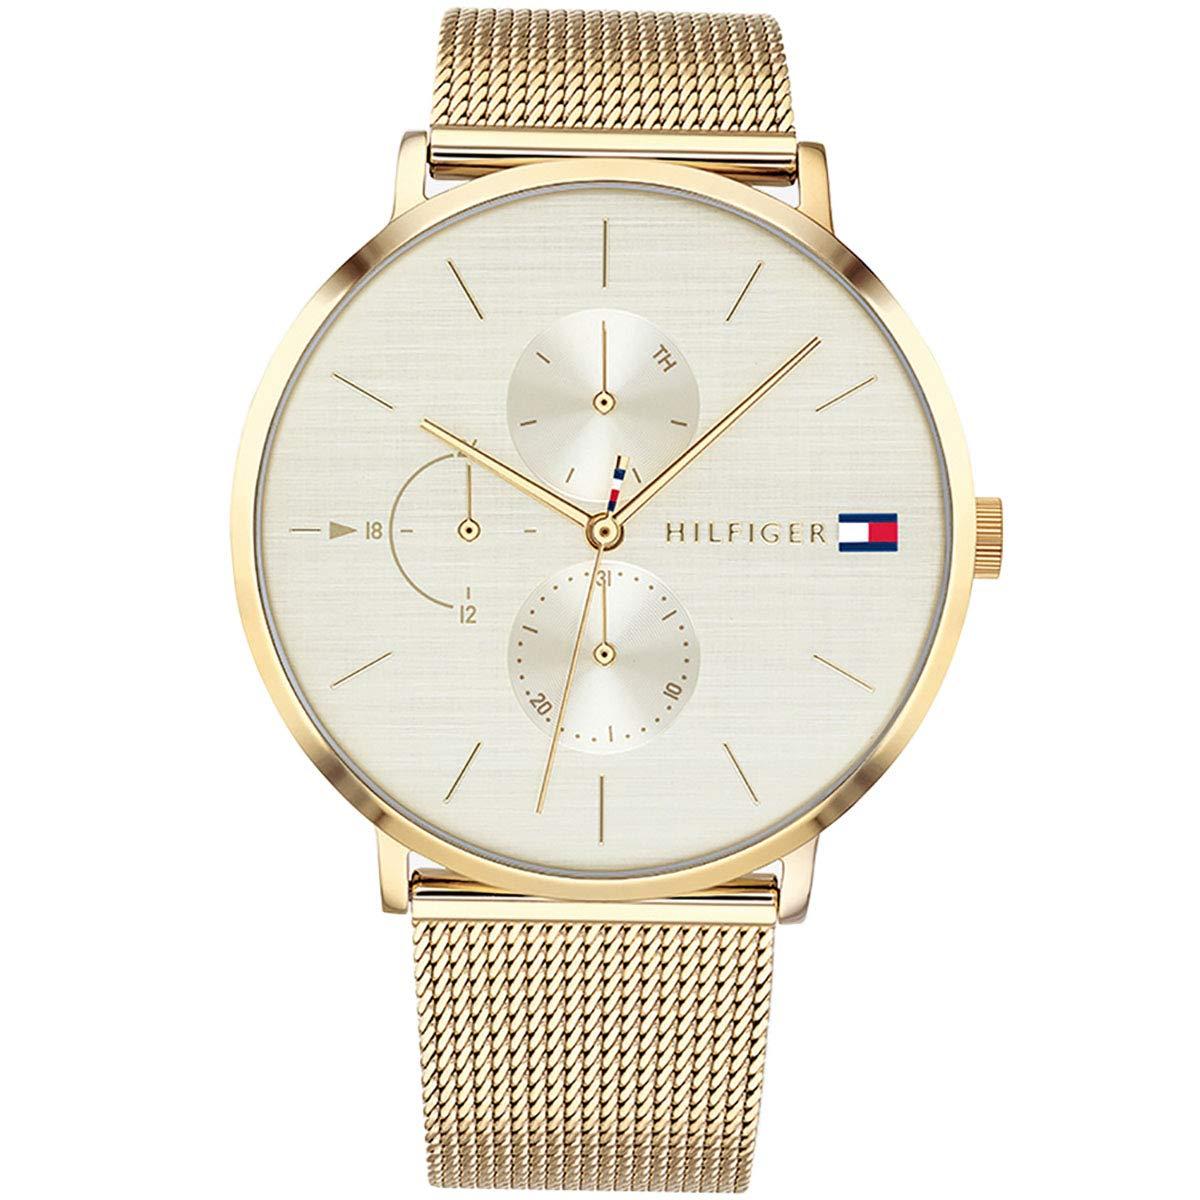 Amazon.com: 1781943 Tommy Hilfiger Jenna Ladies Analog White Sport Quartz Tommy Hilfiger: Watches